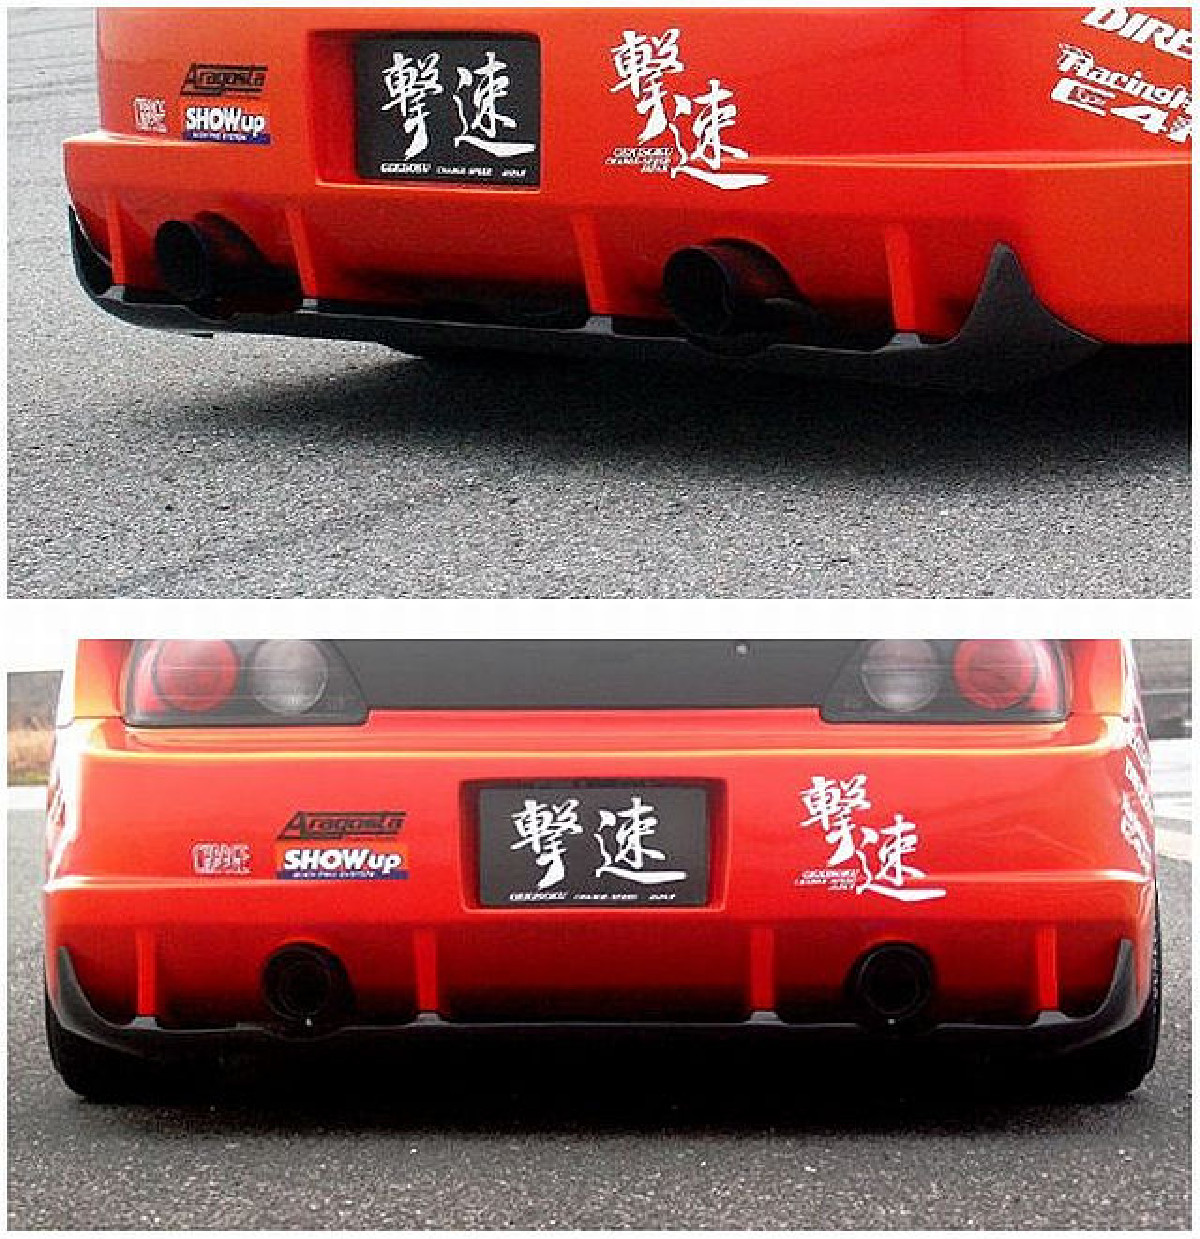 Chargespeed Carbon Heckdiffusor Honda S2000 AP1 (99-03)